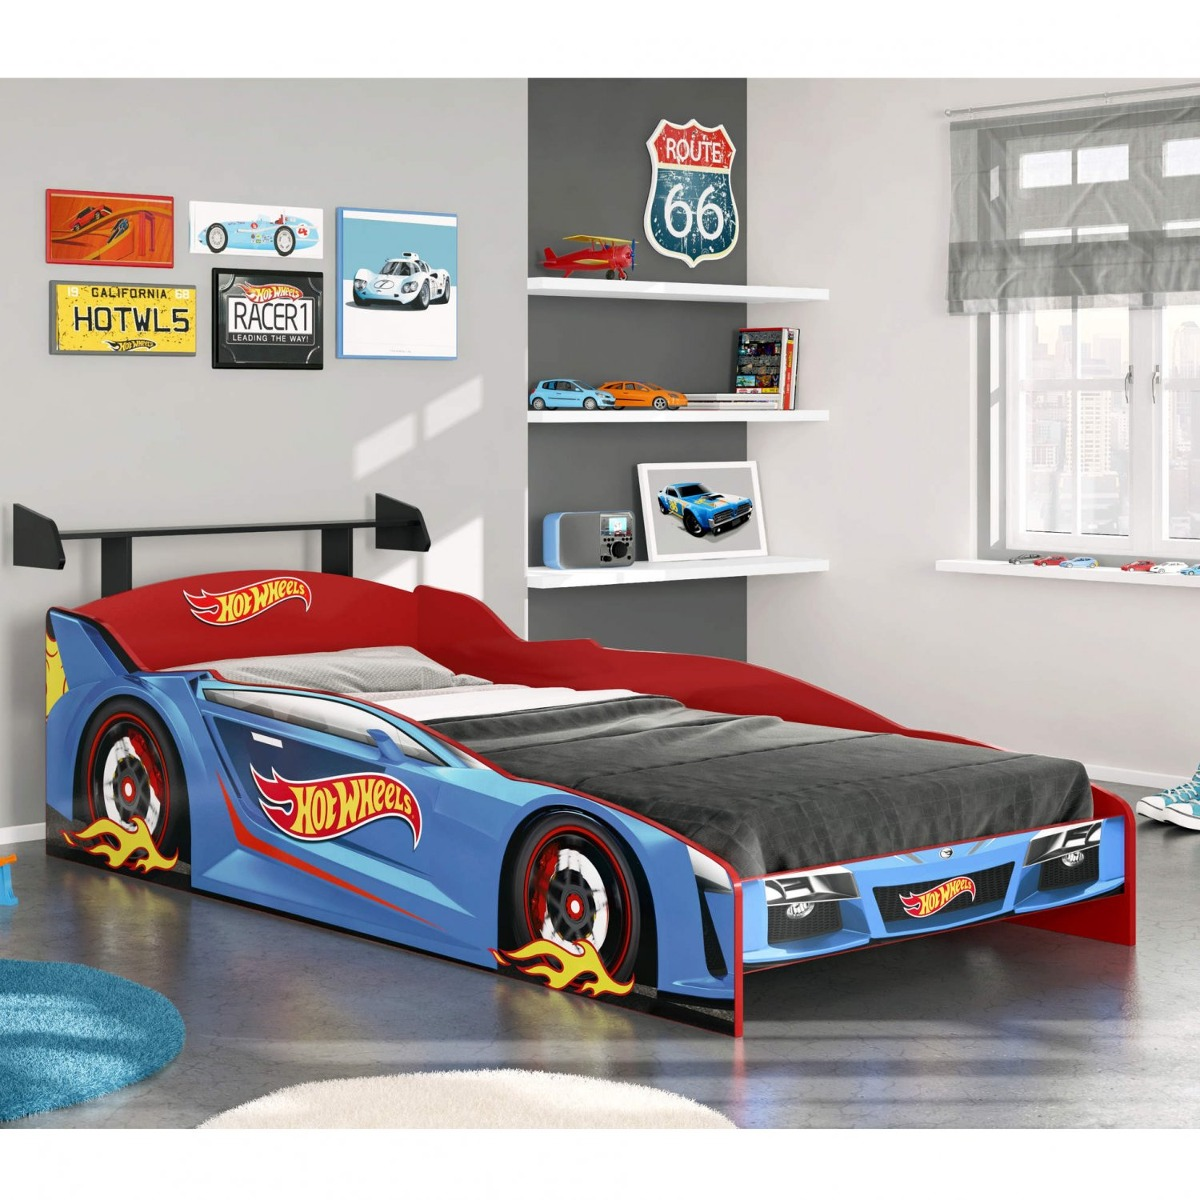 6931b01c9a cama infantil hot wheels plus pura magia azul fhwt. Carregando zoom.